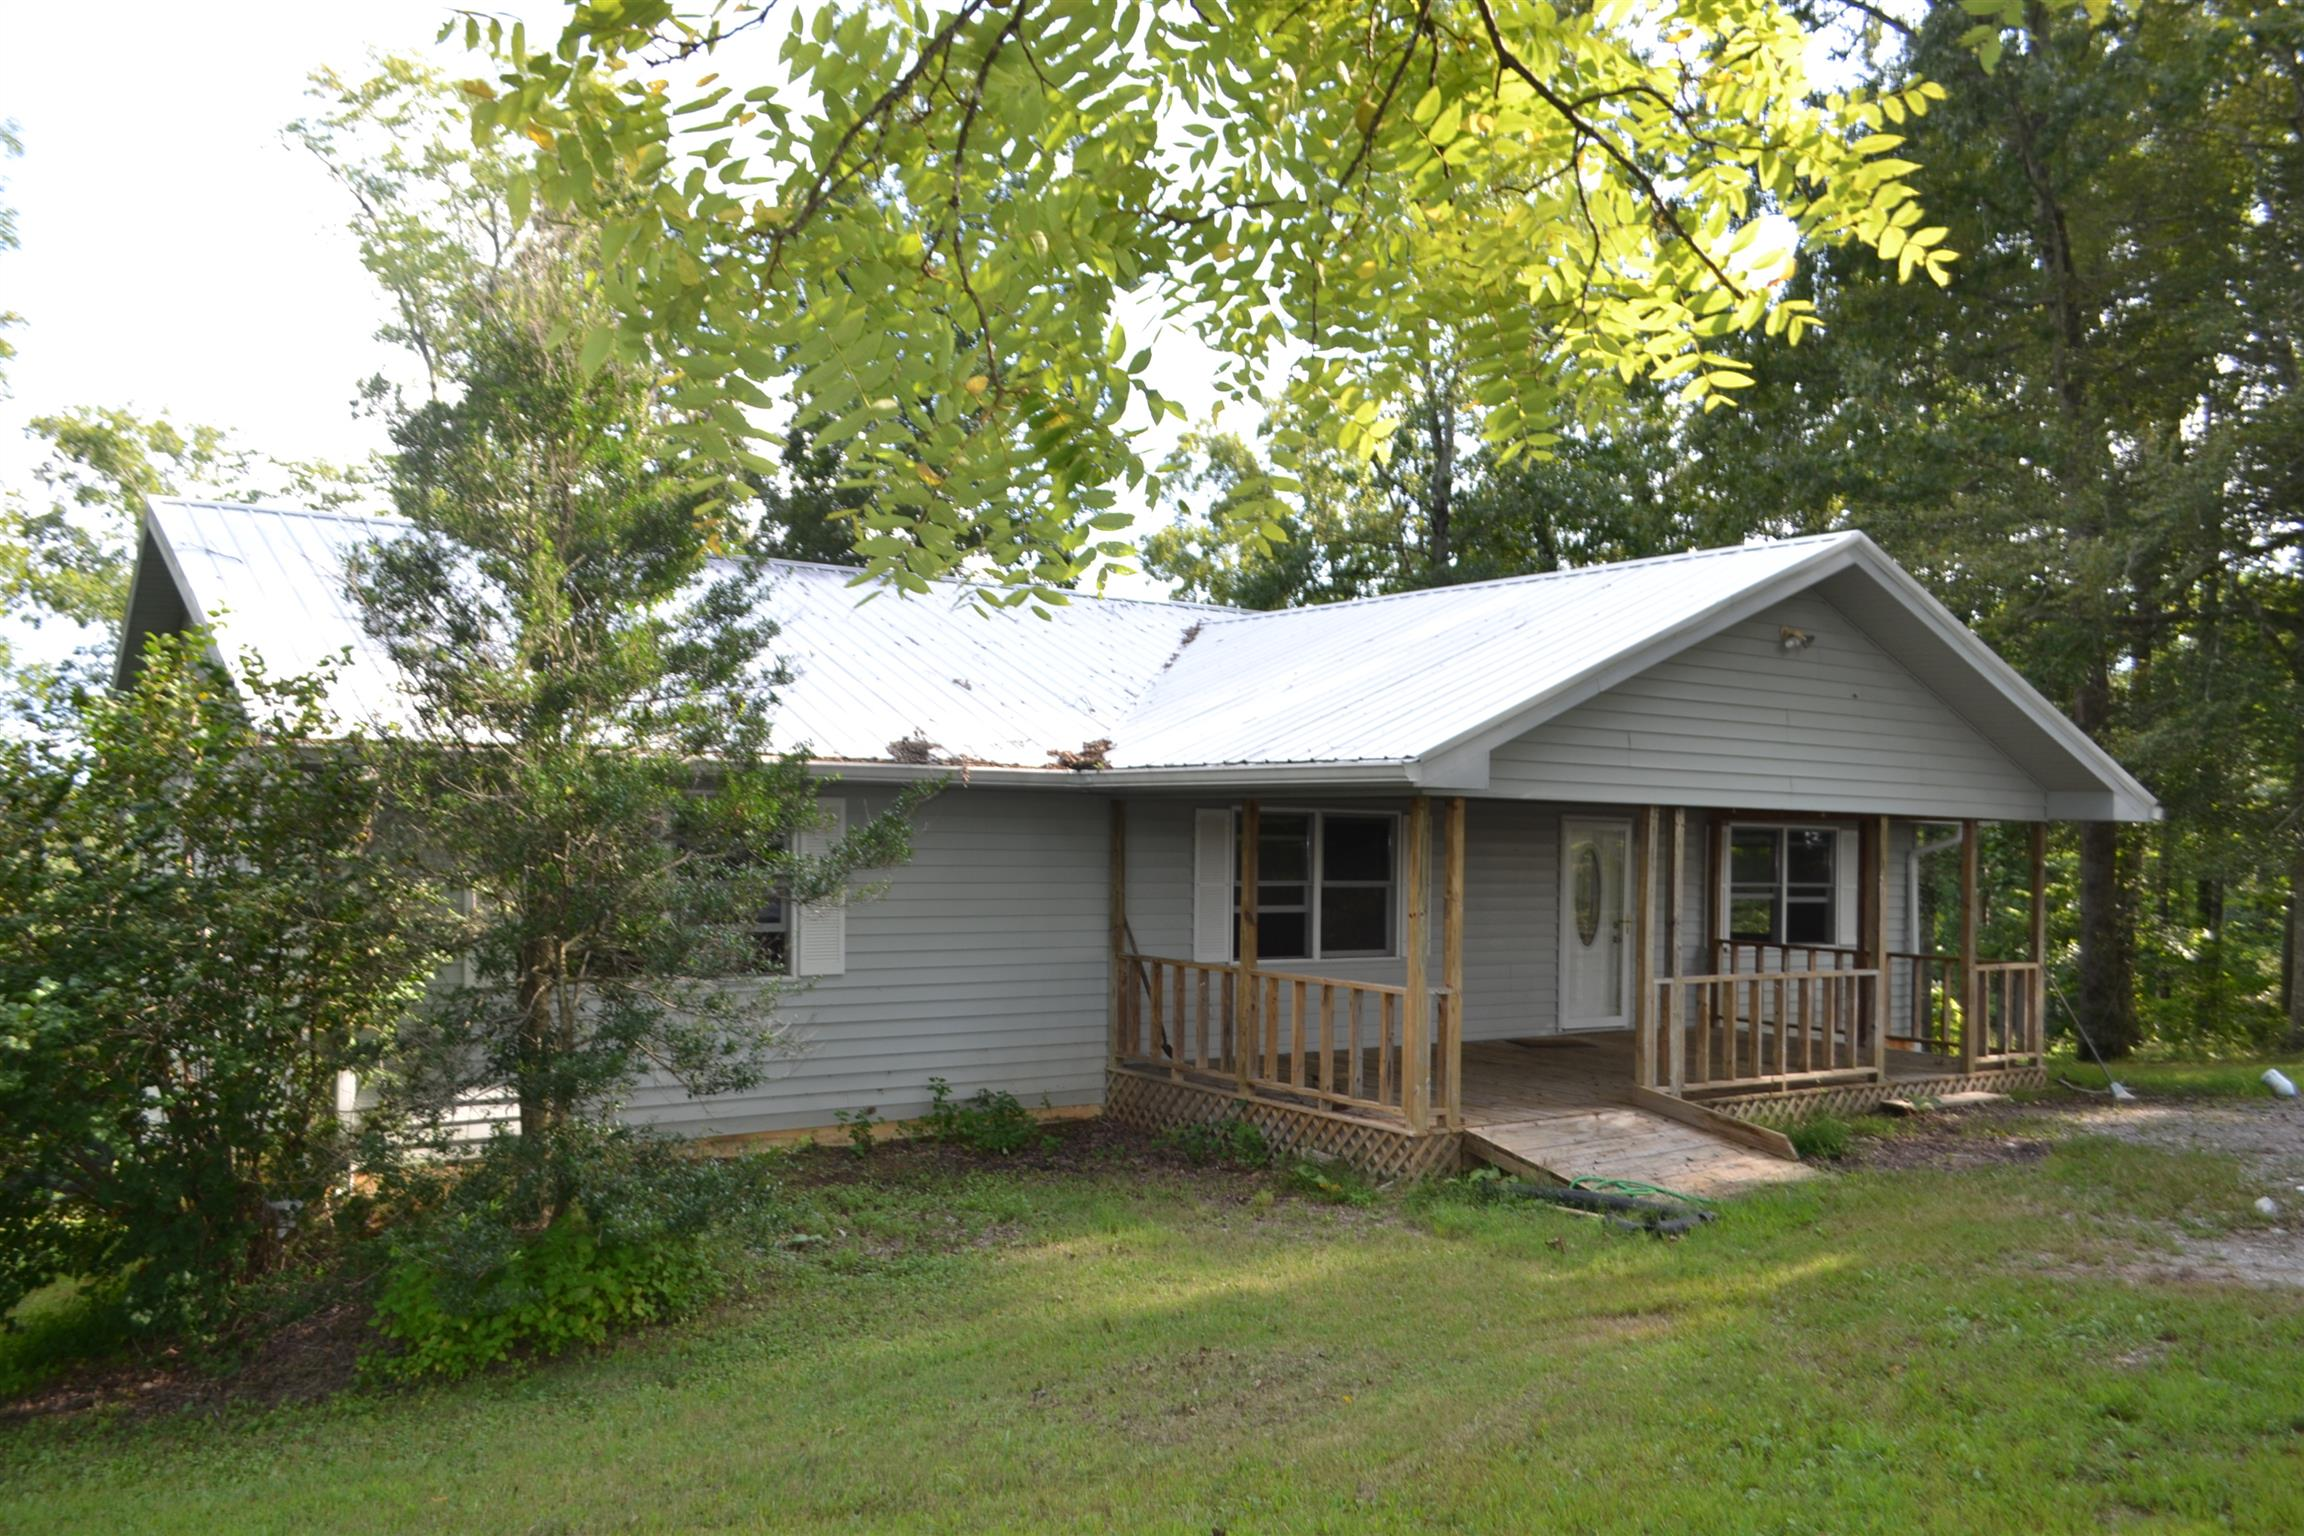 1527 Hideaway Ln, Rock Island, TN 38581 - Rock Island, TN real estate listing